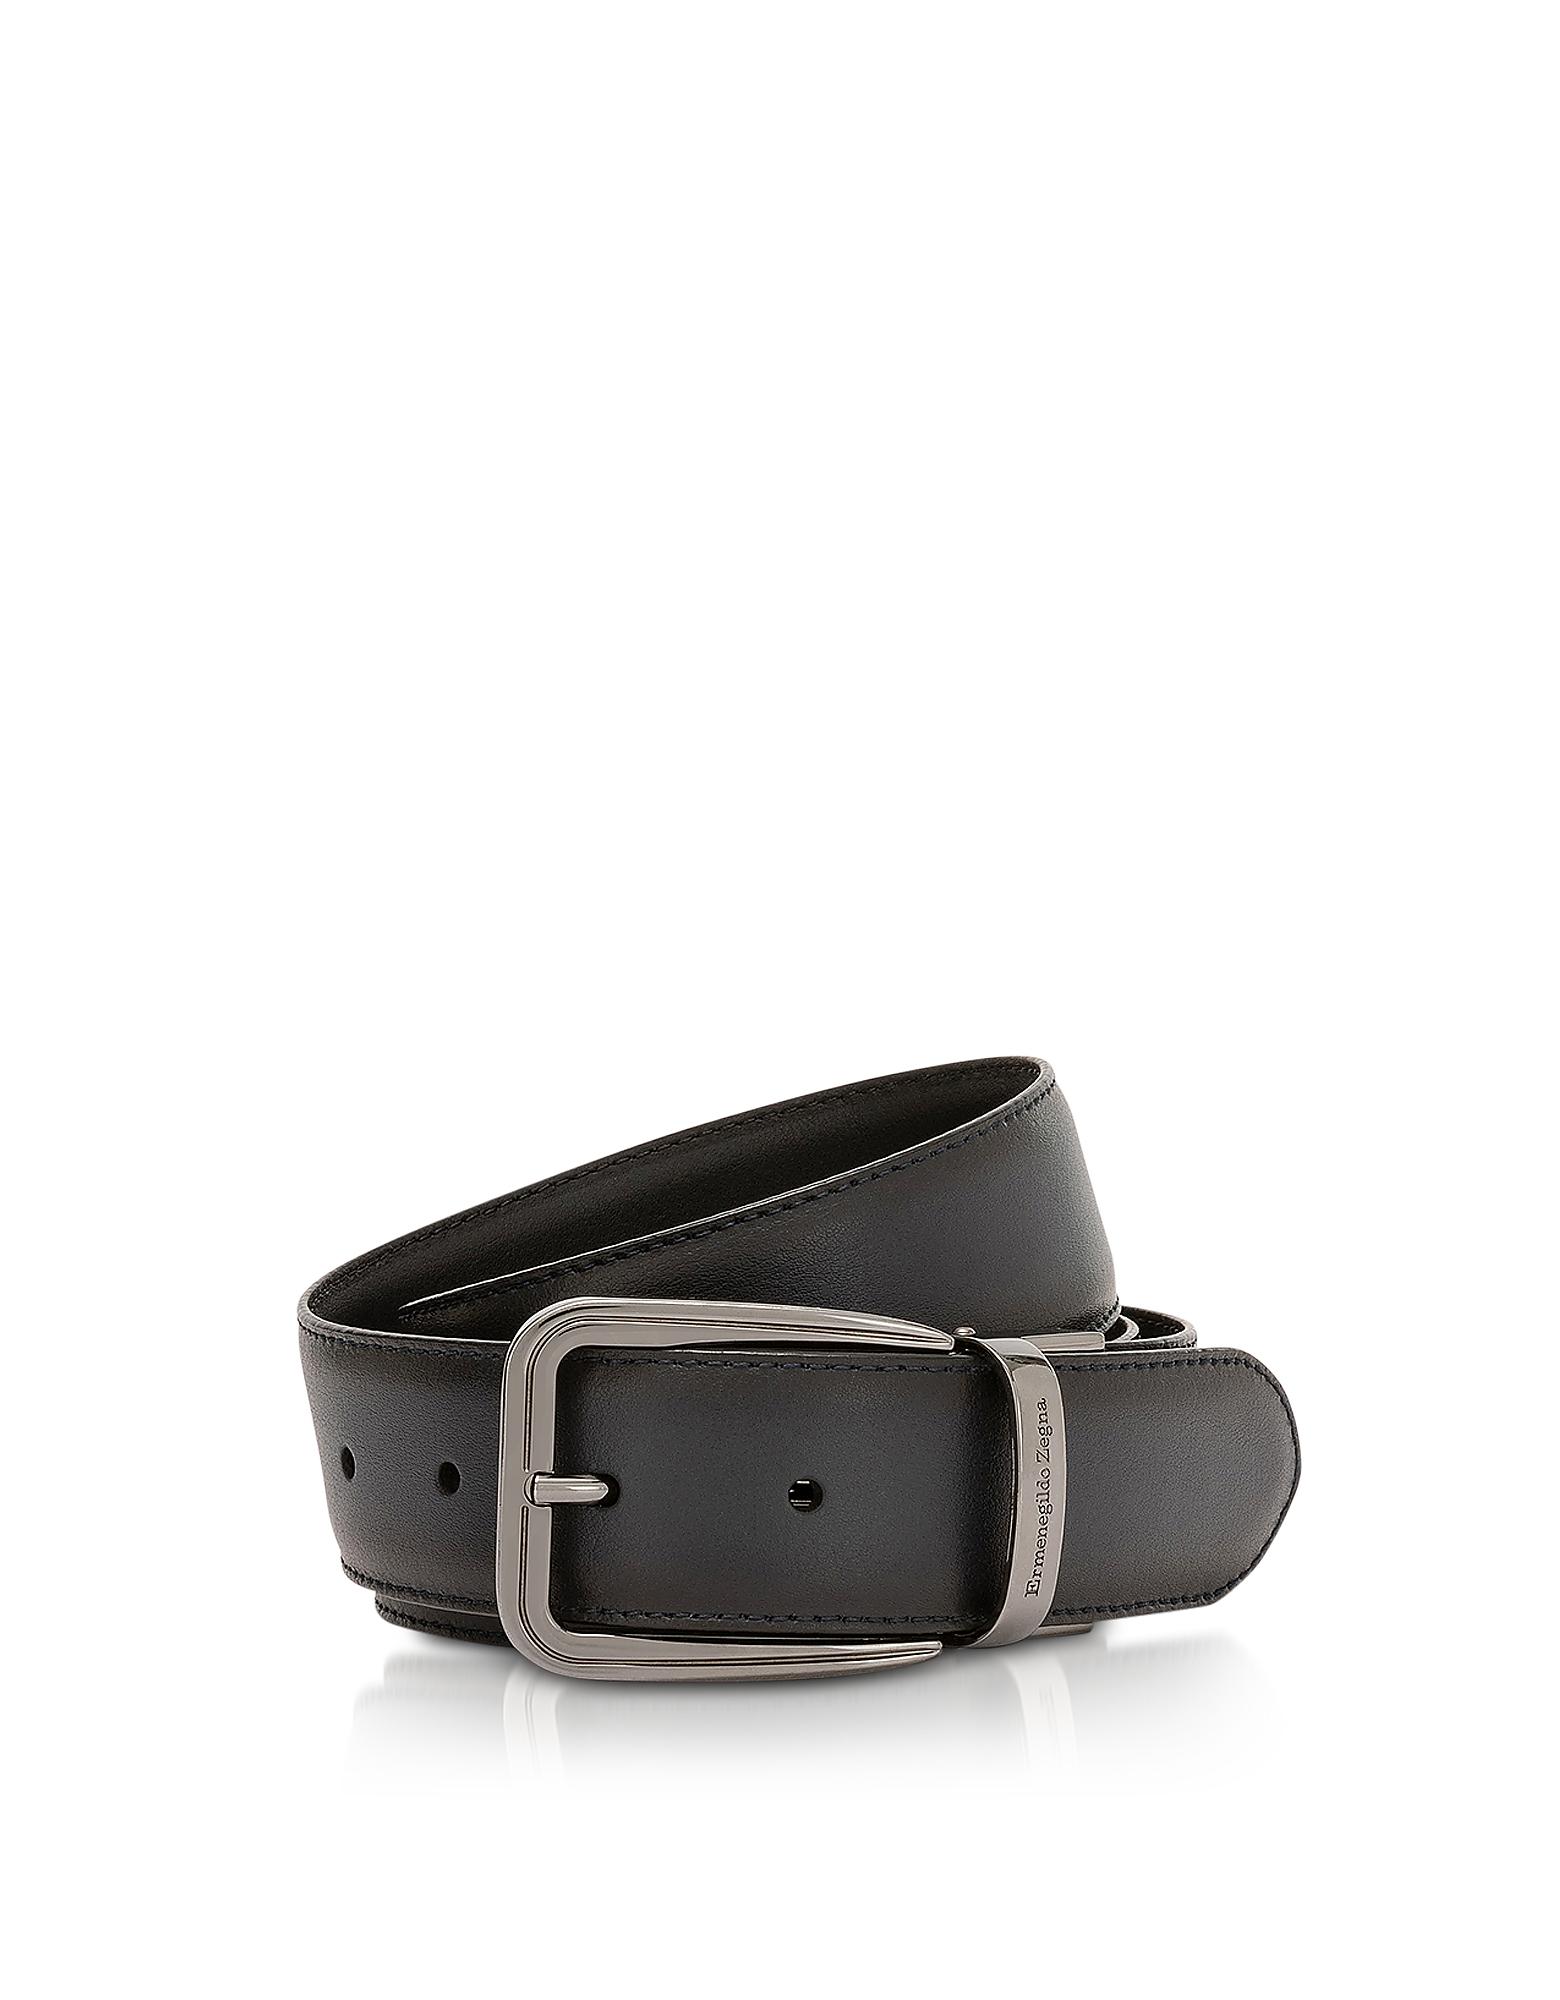 Navy Blue Calf Leather Men's Belt